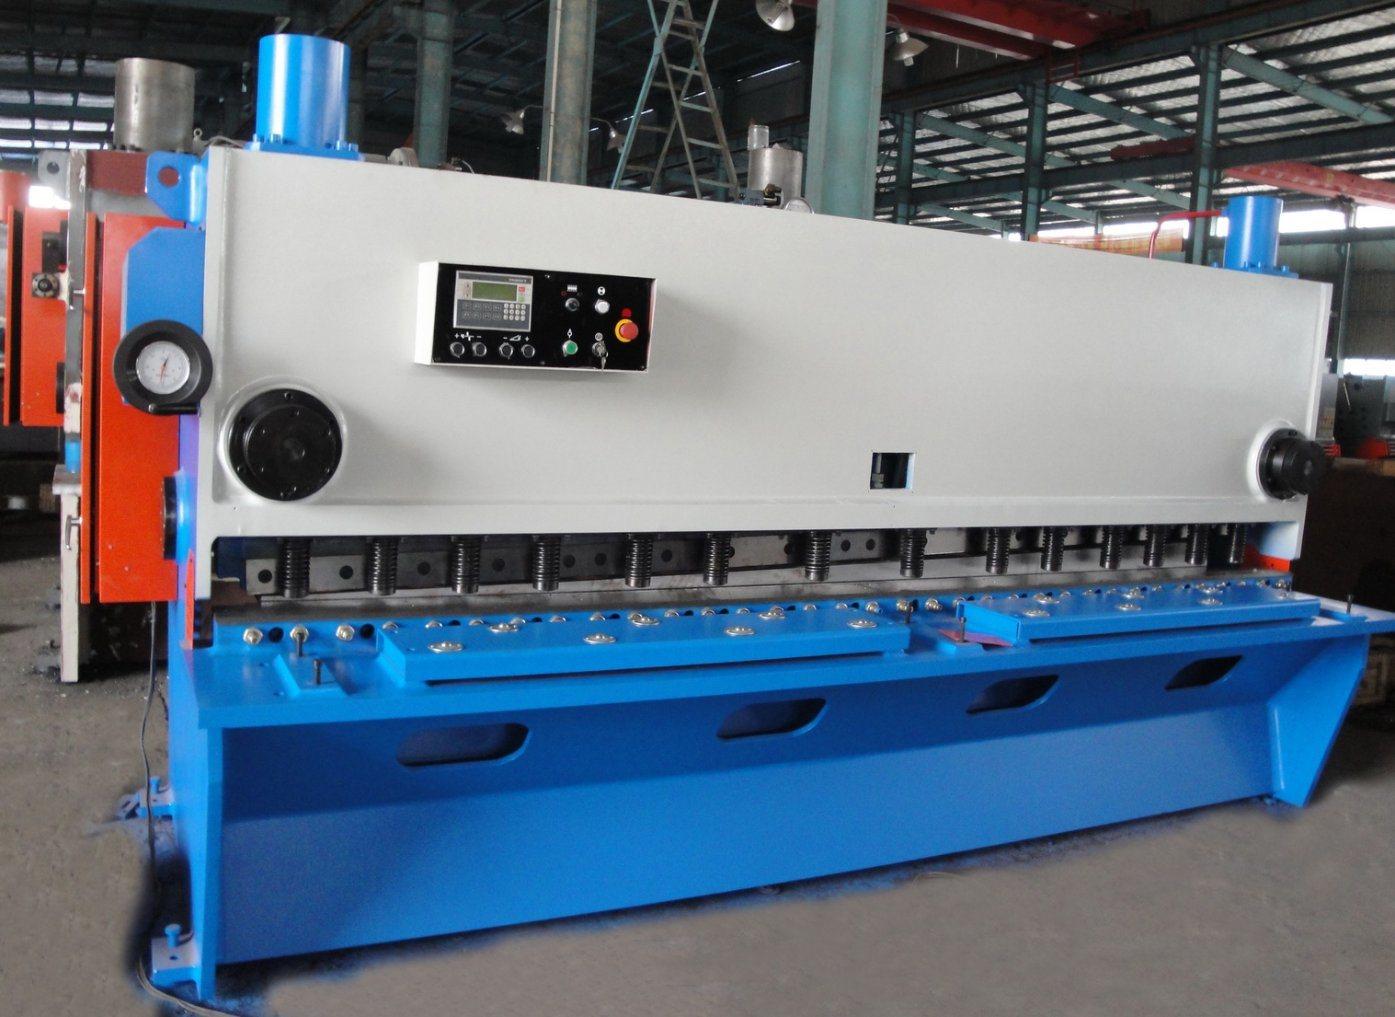 Hydraulic Guillotine Shearing Machine Cutting Steel Plate